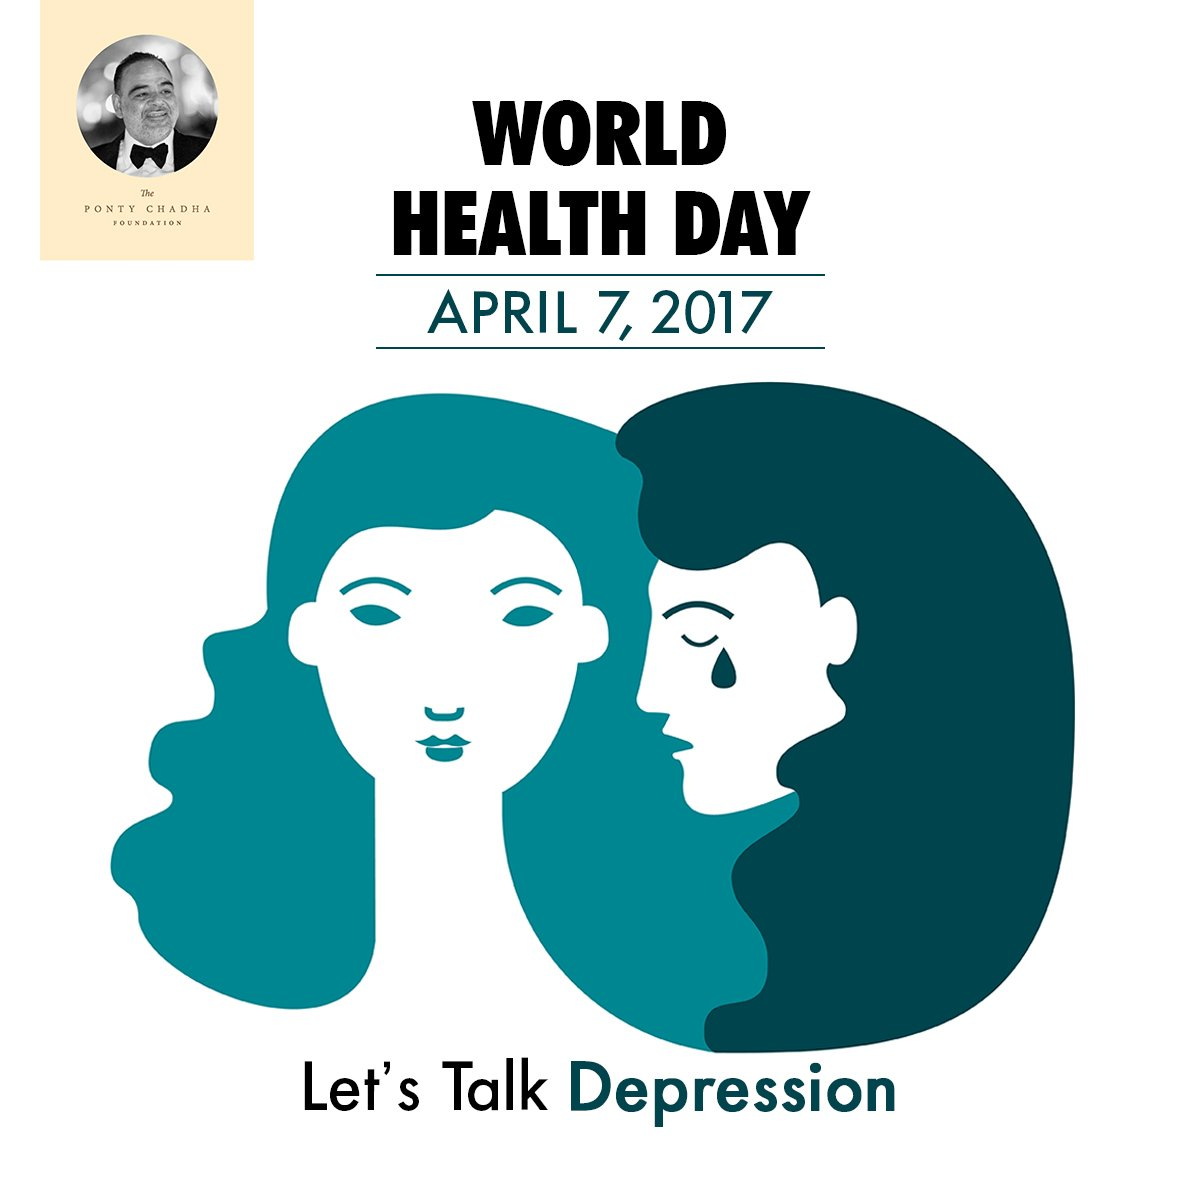 World Health Day: Let's Talk Depression